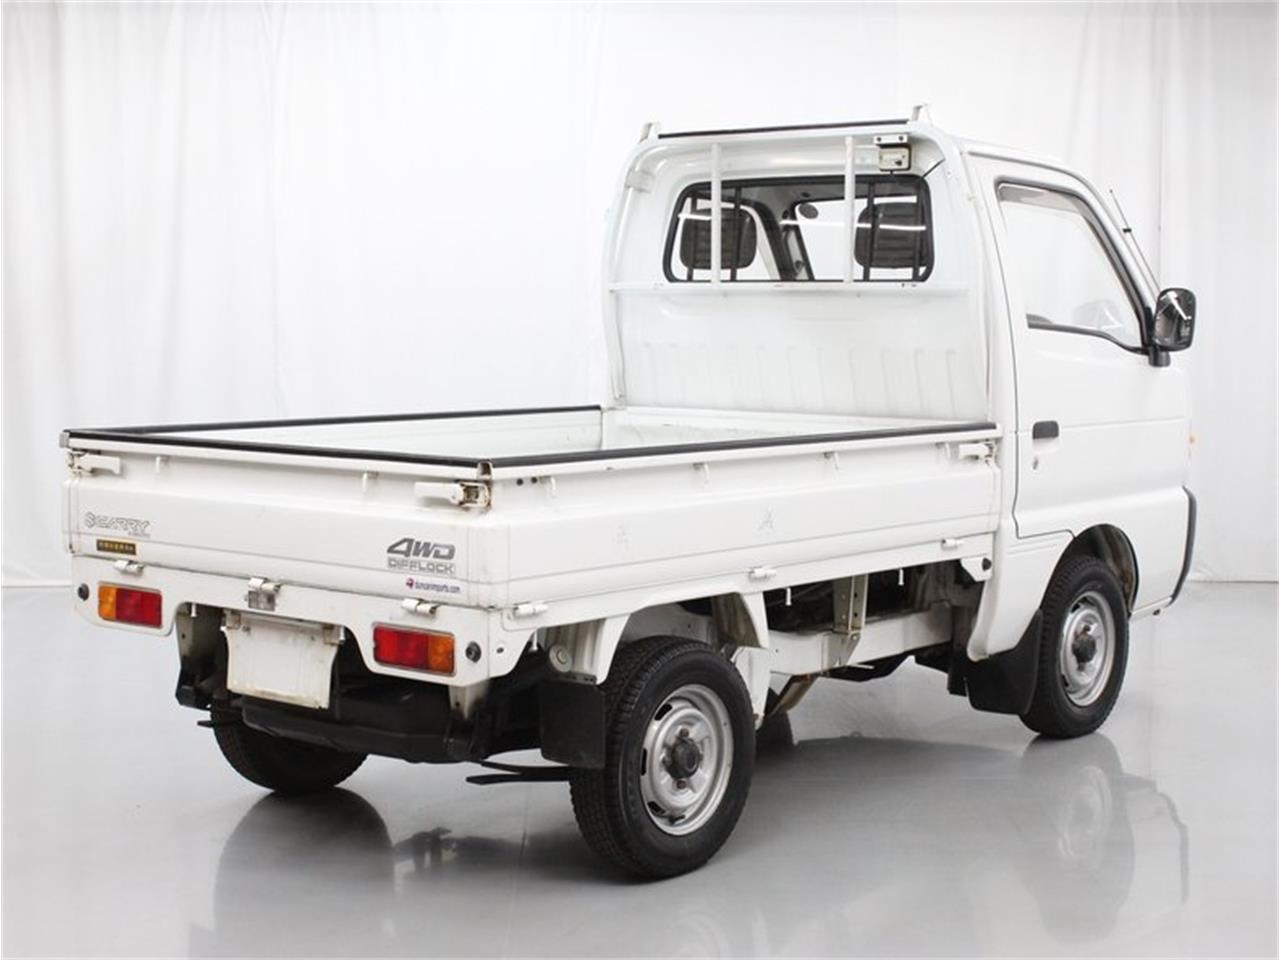 1994 Suzuki Carry (CC-1416014) for sale in Christiansburg, Virginia